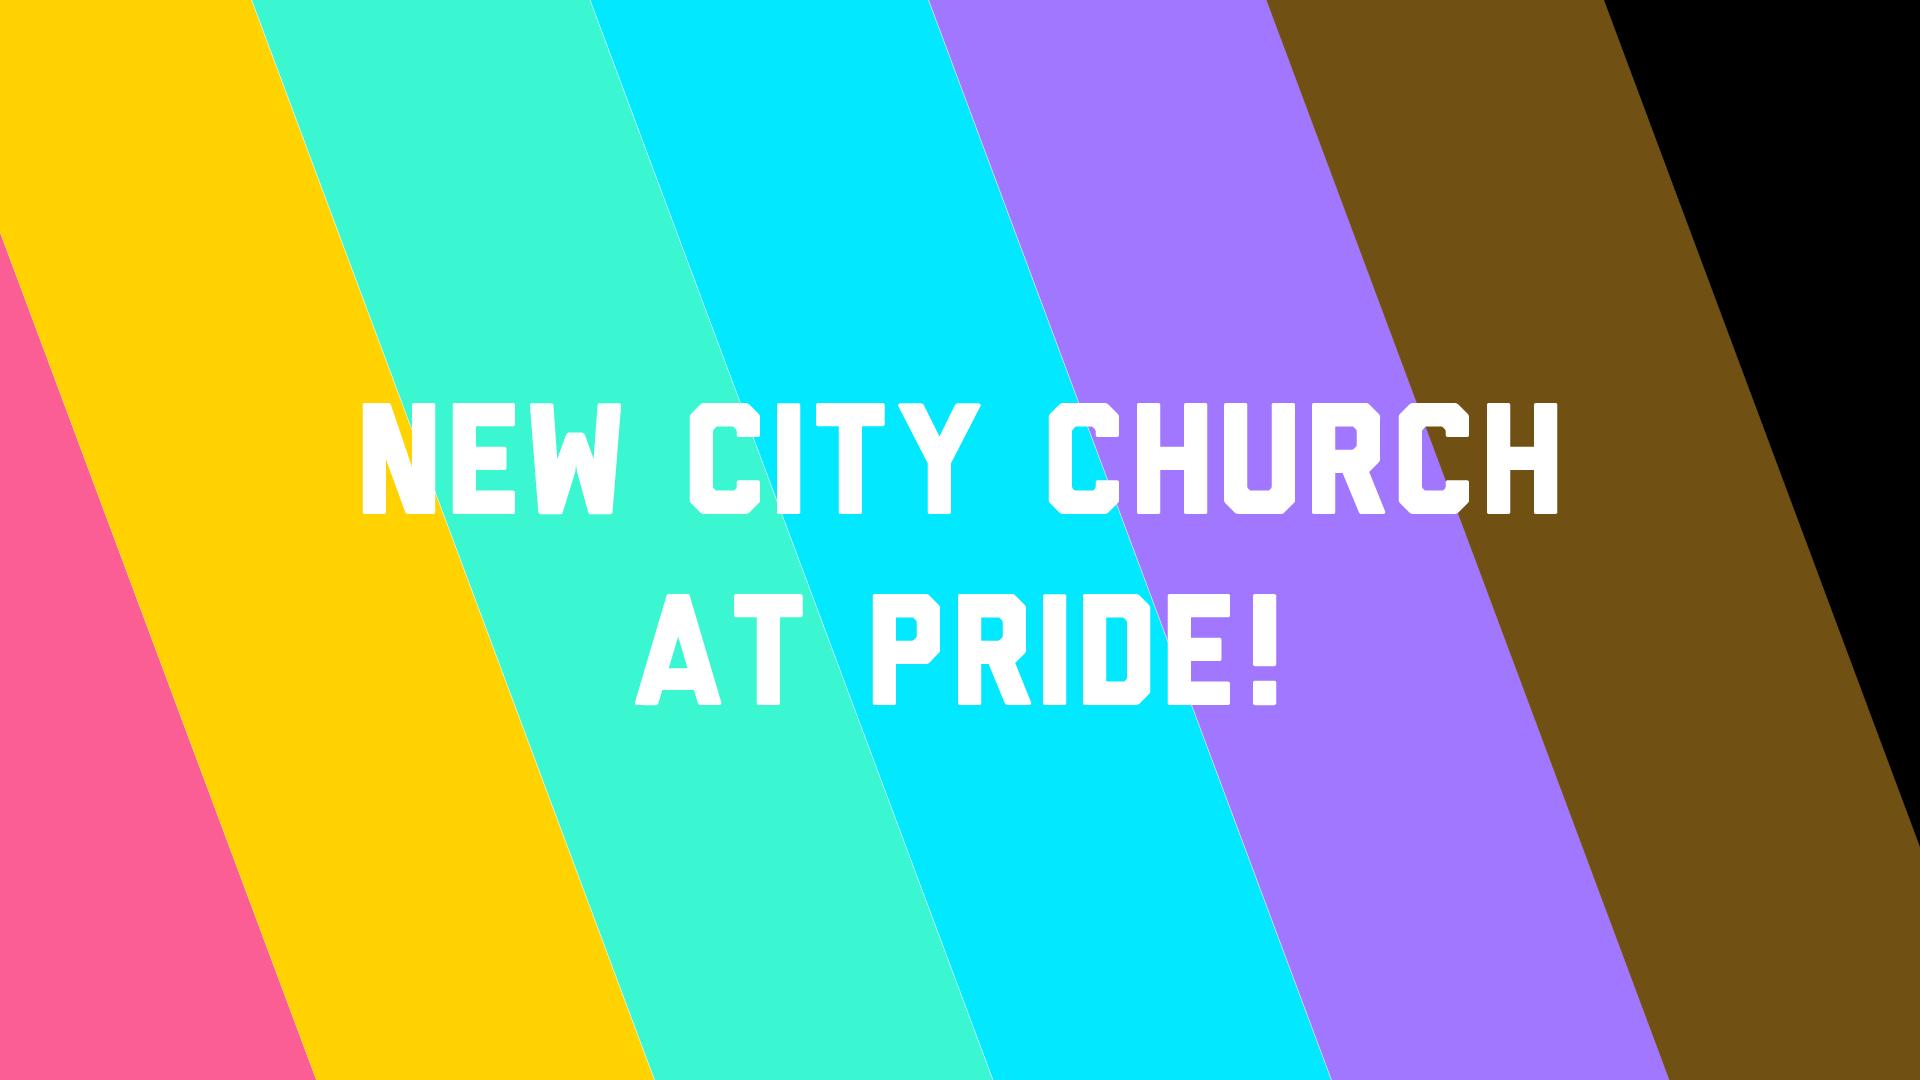 PrideSocialBanner.png